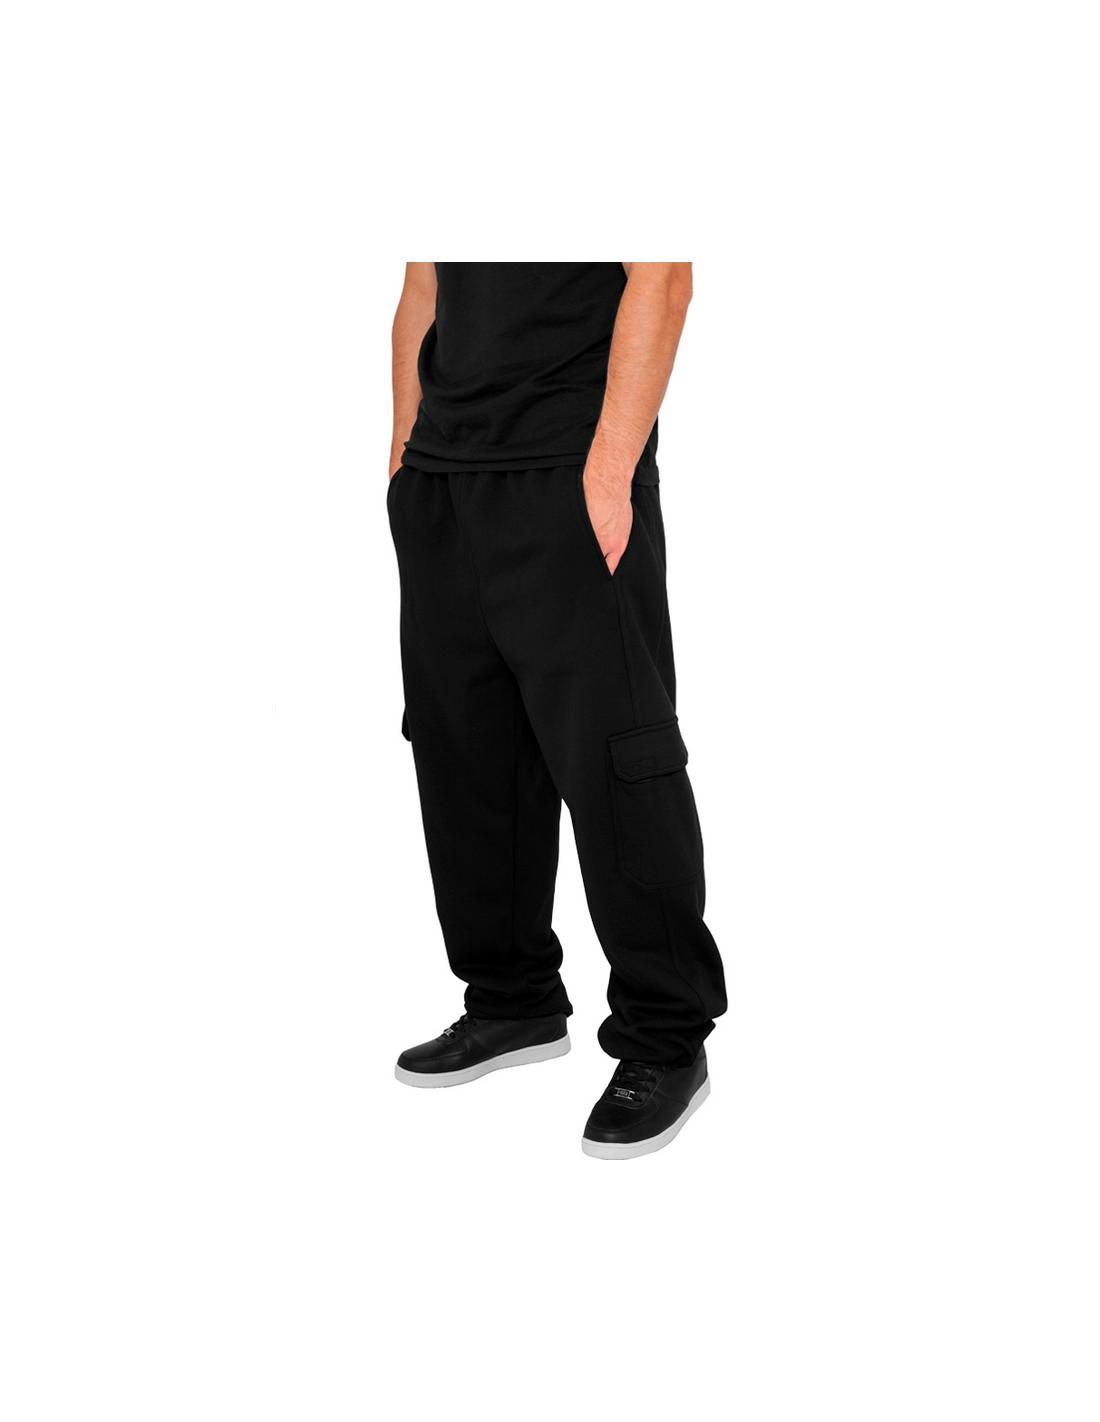 Urban Cargo Sweatpants Black